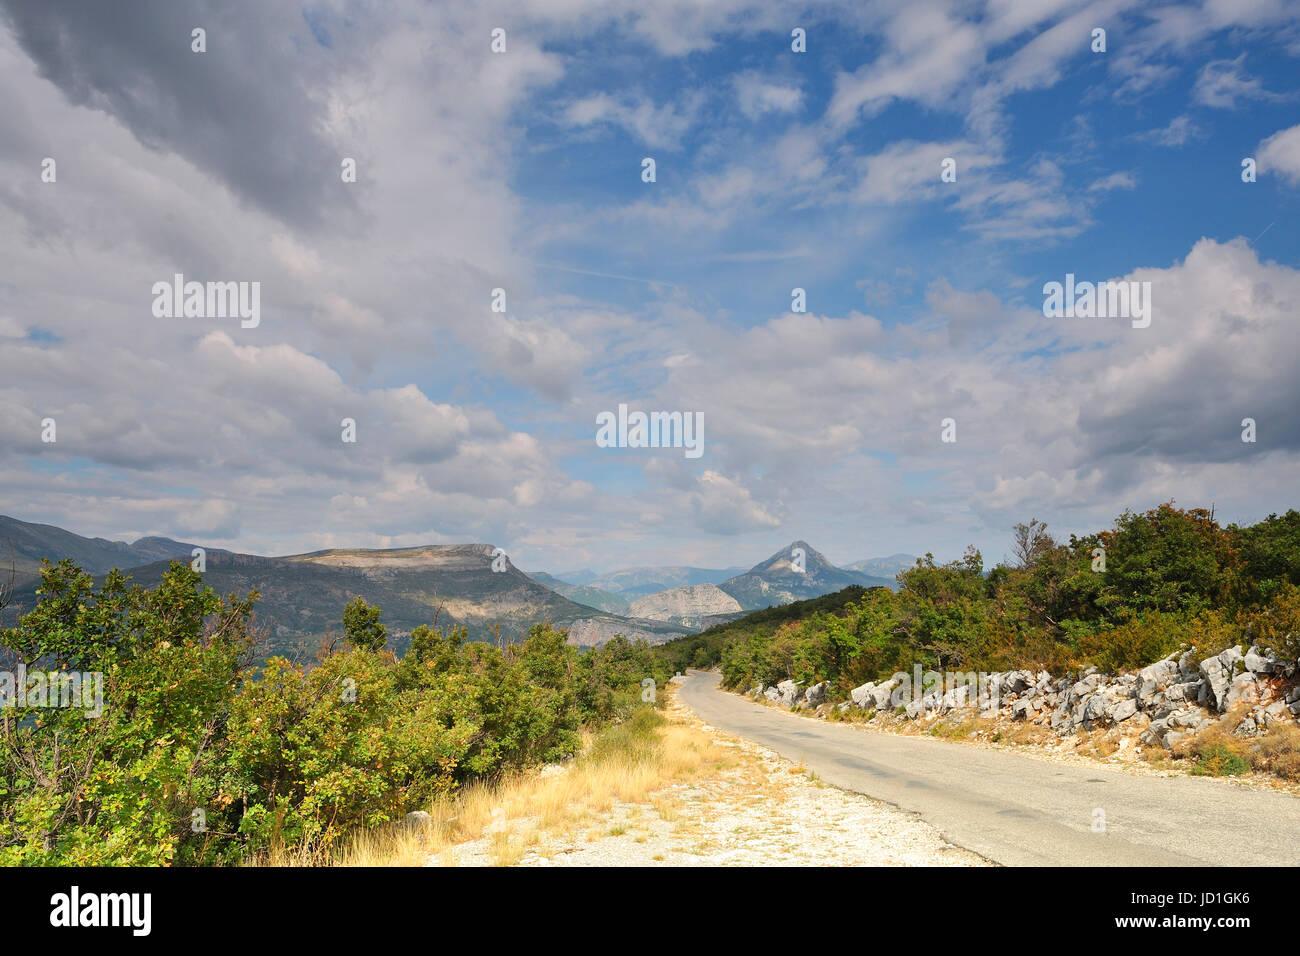 national park, alps, france, ravine, mountain, national park, alps, width, Stock Photo